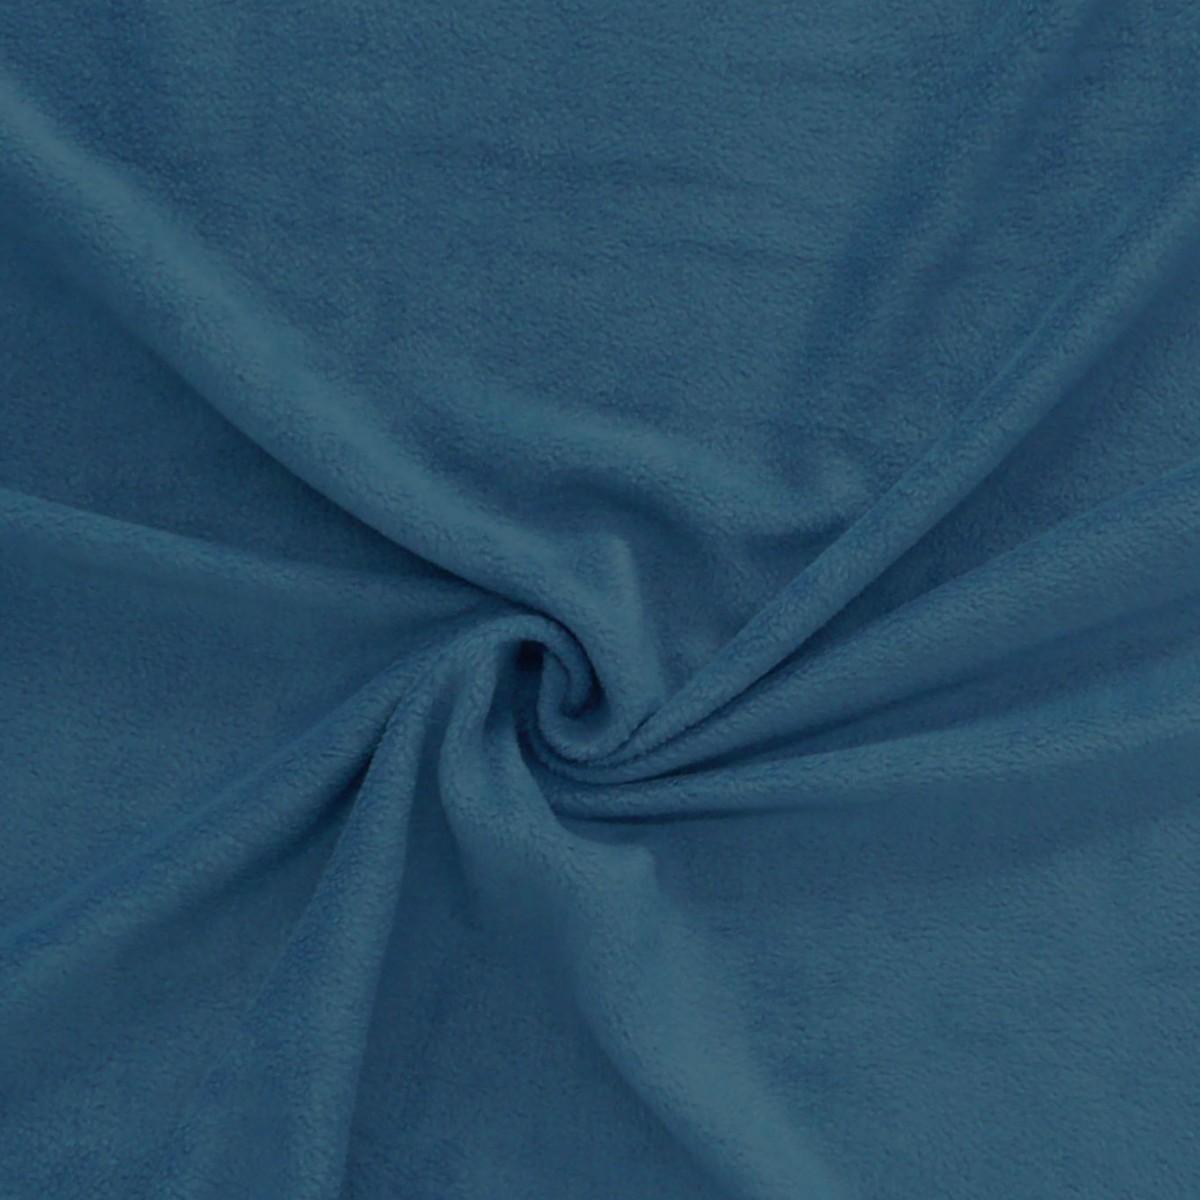 polar fleece stoffe fleecestoff dunkel petrol stoffe stoffe uni fleece. Black Bedroom Furniture Sets. Home Design Ideas